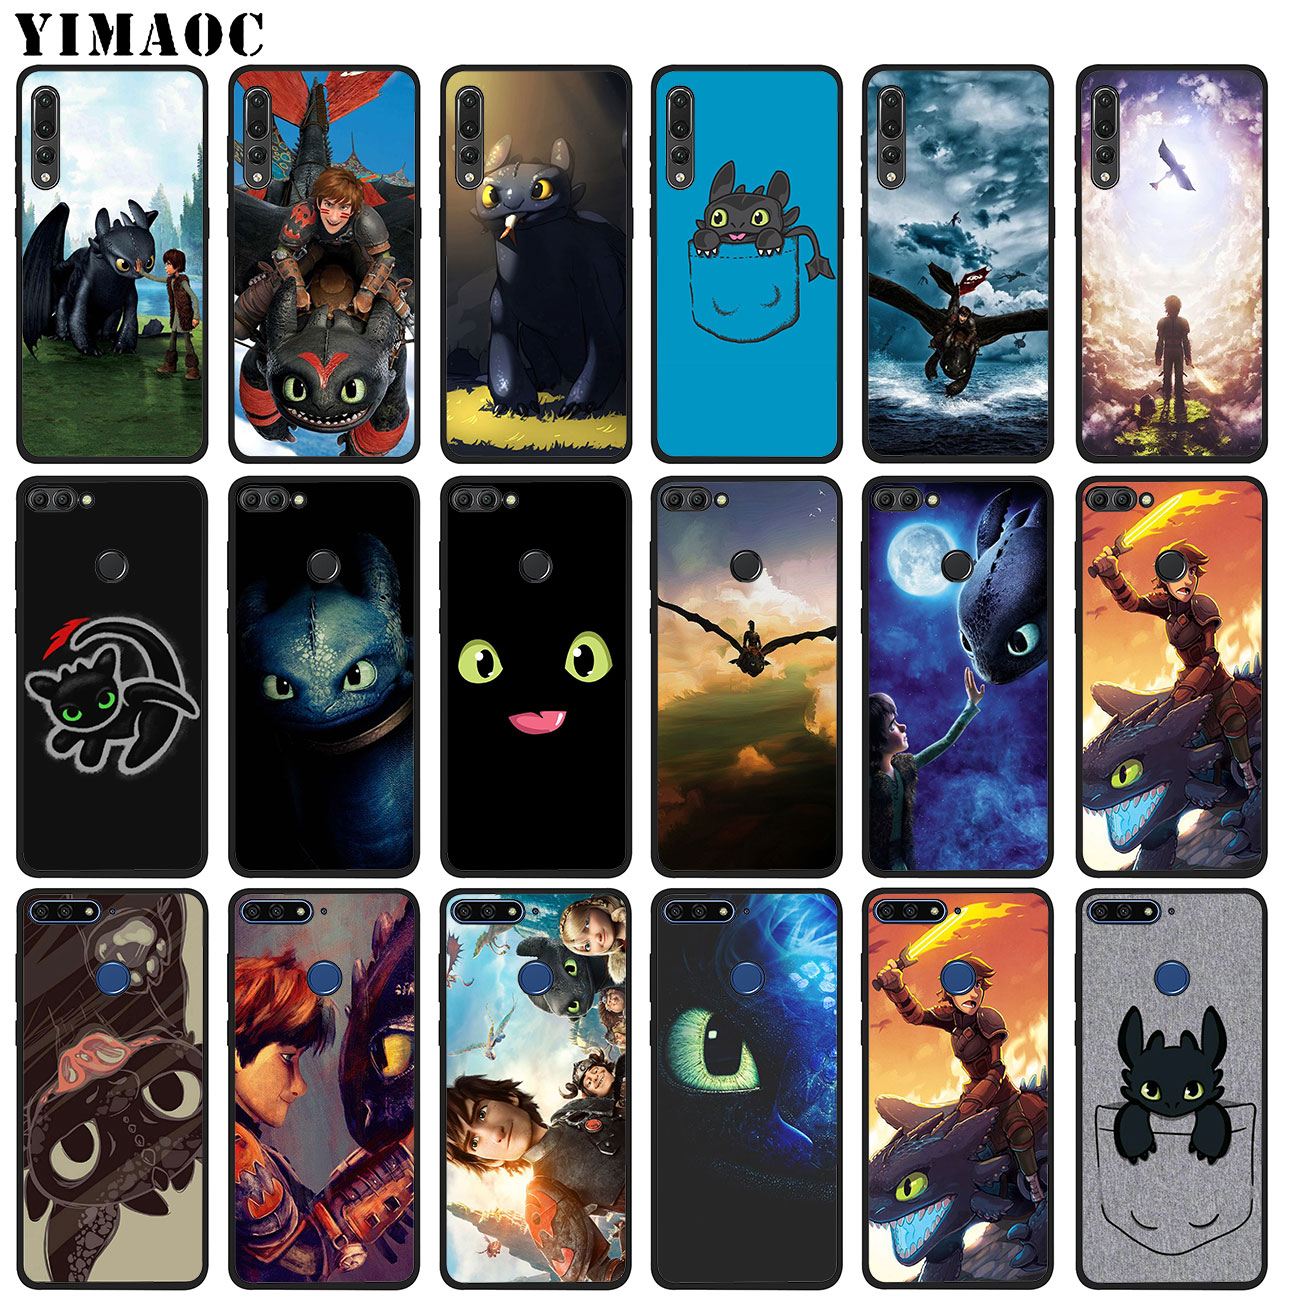 YIMAOC Zahnlos Zug Ihre Drachen Weichen Silikon Telefon Fall für Huawei P20 Pro P10 P9 P8 Lite Mini 2017 P smart Z 2019 Abdeckung